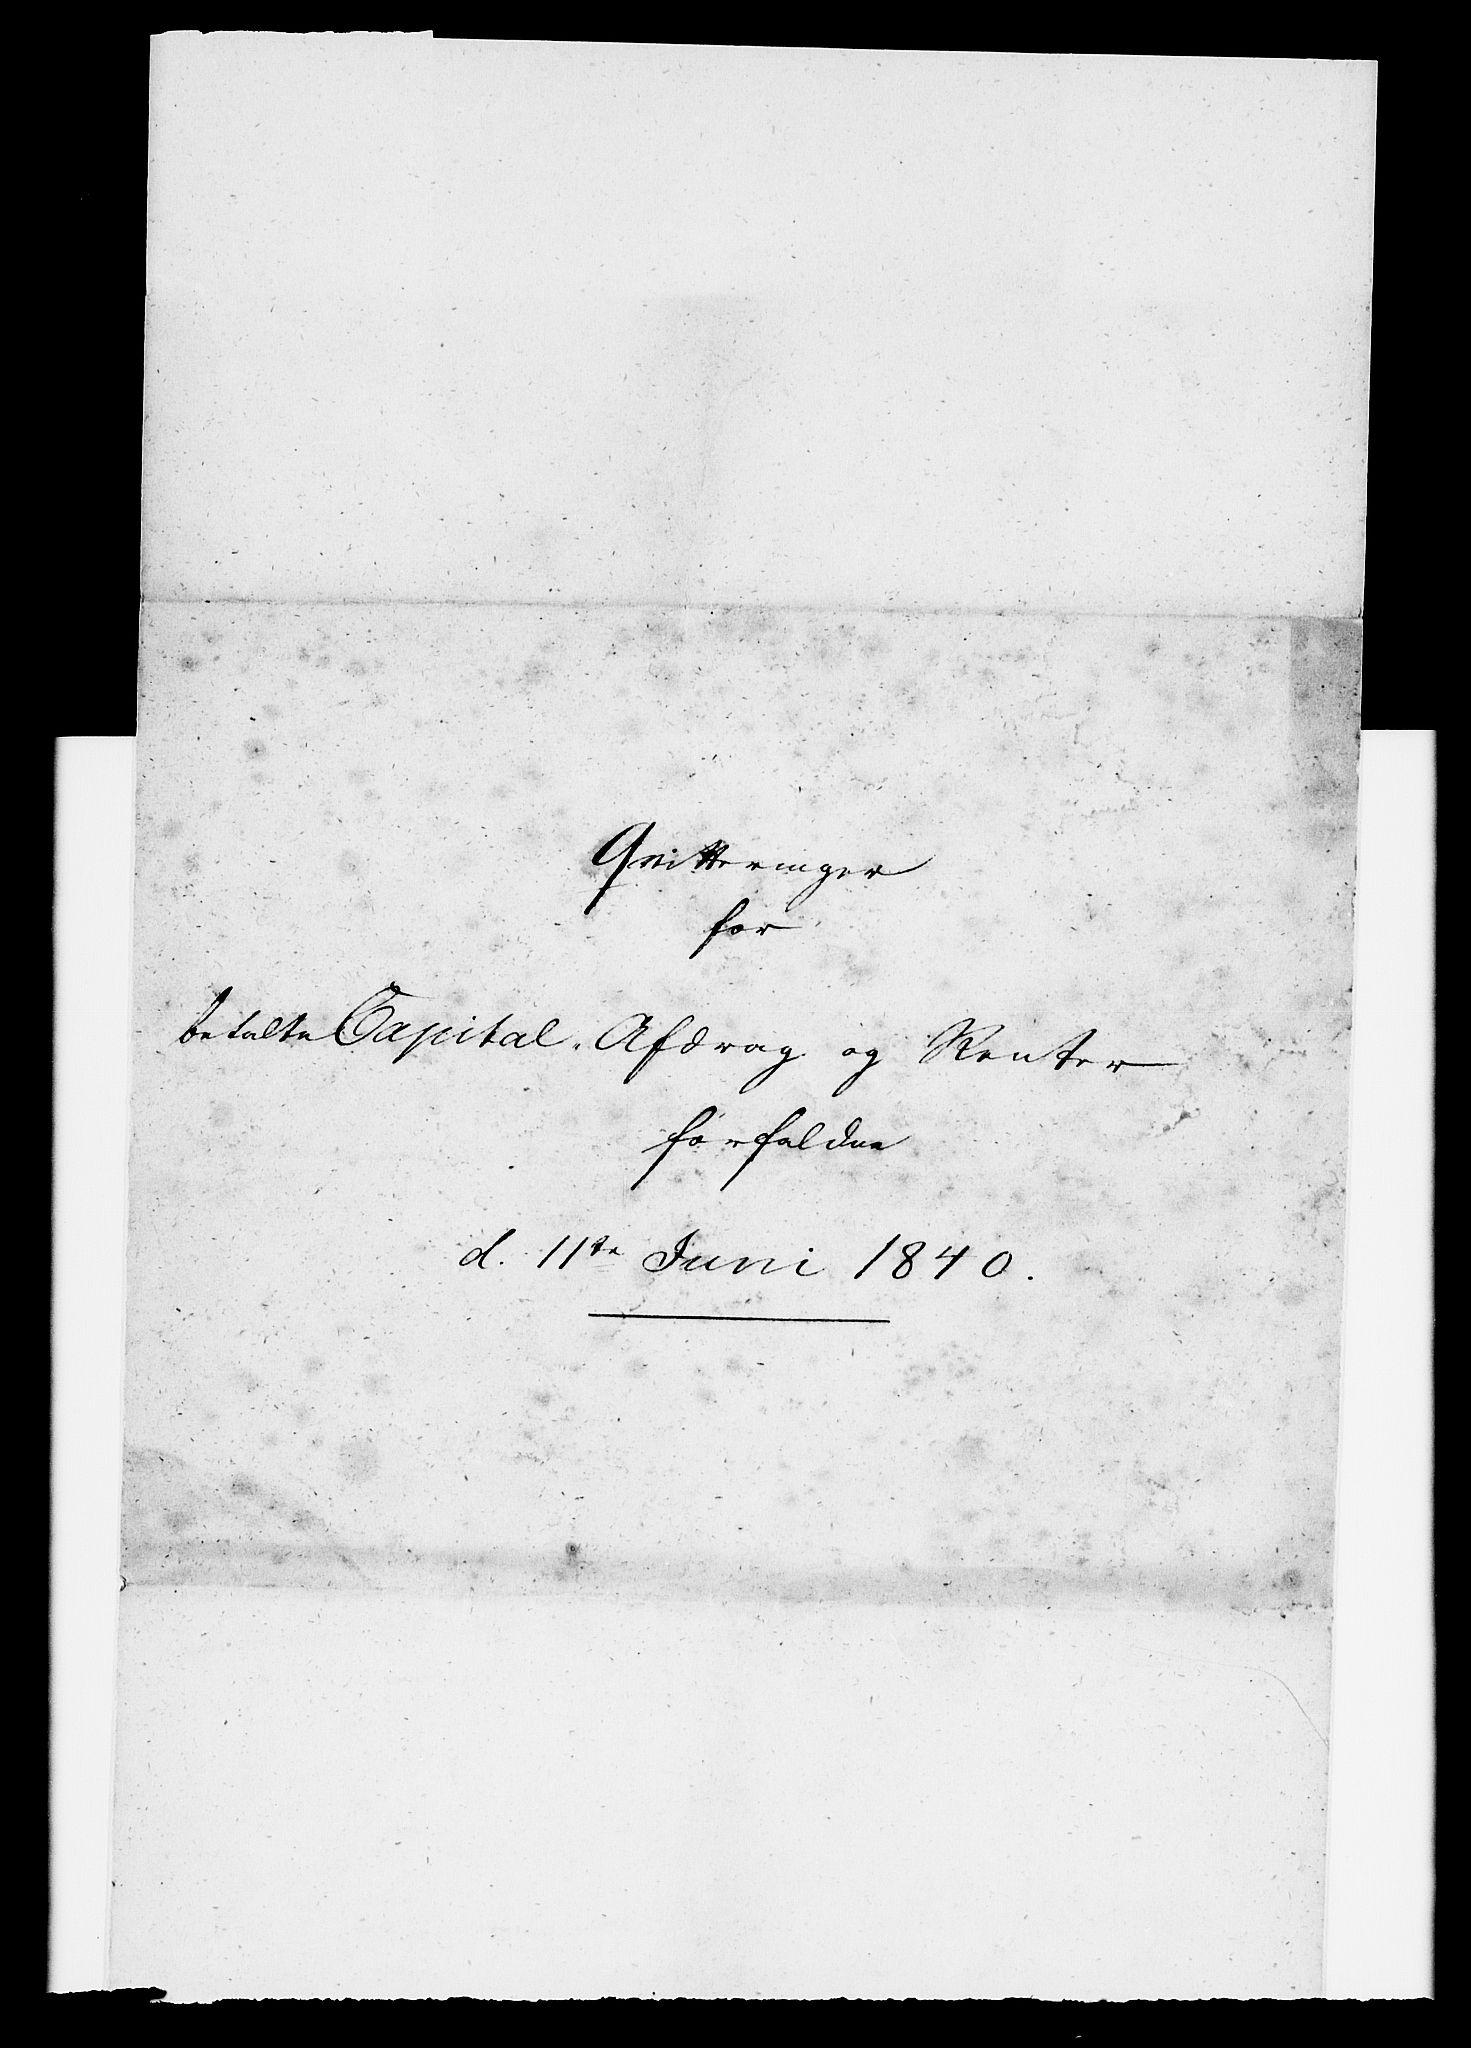 RA, Modums Blaafarveværk, G/Gd/Gdc/L0213, 1840-1847, s. 2